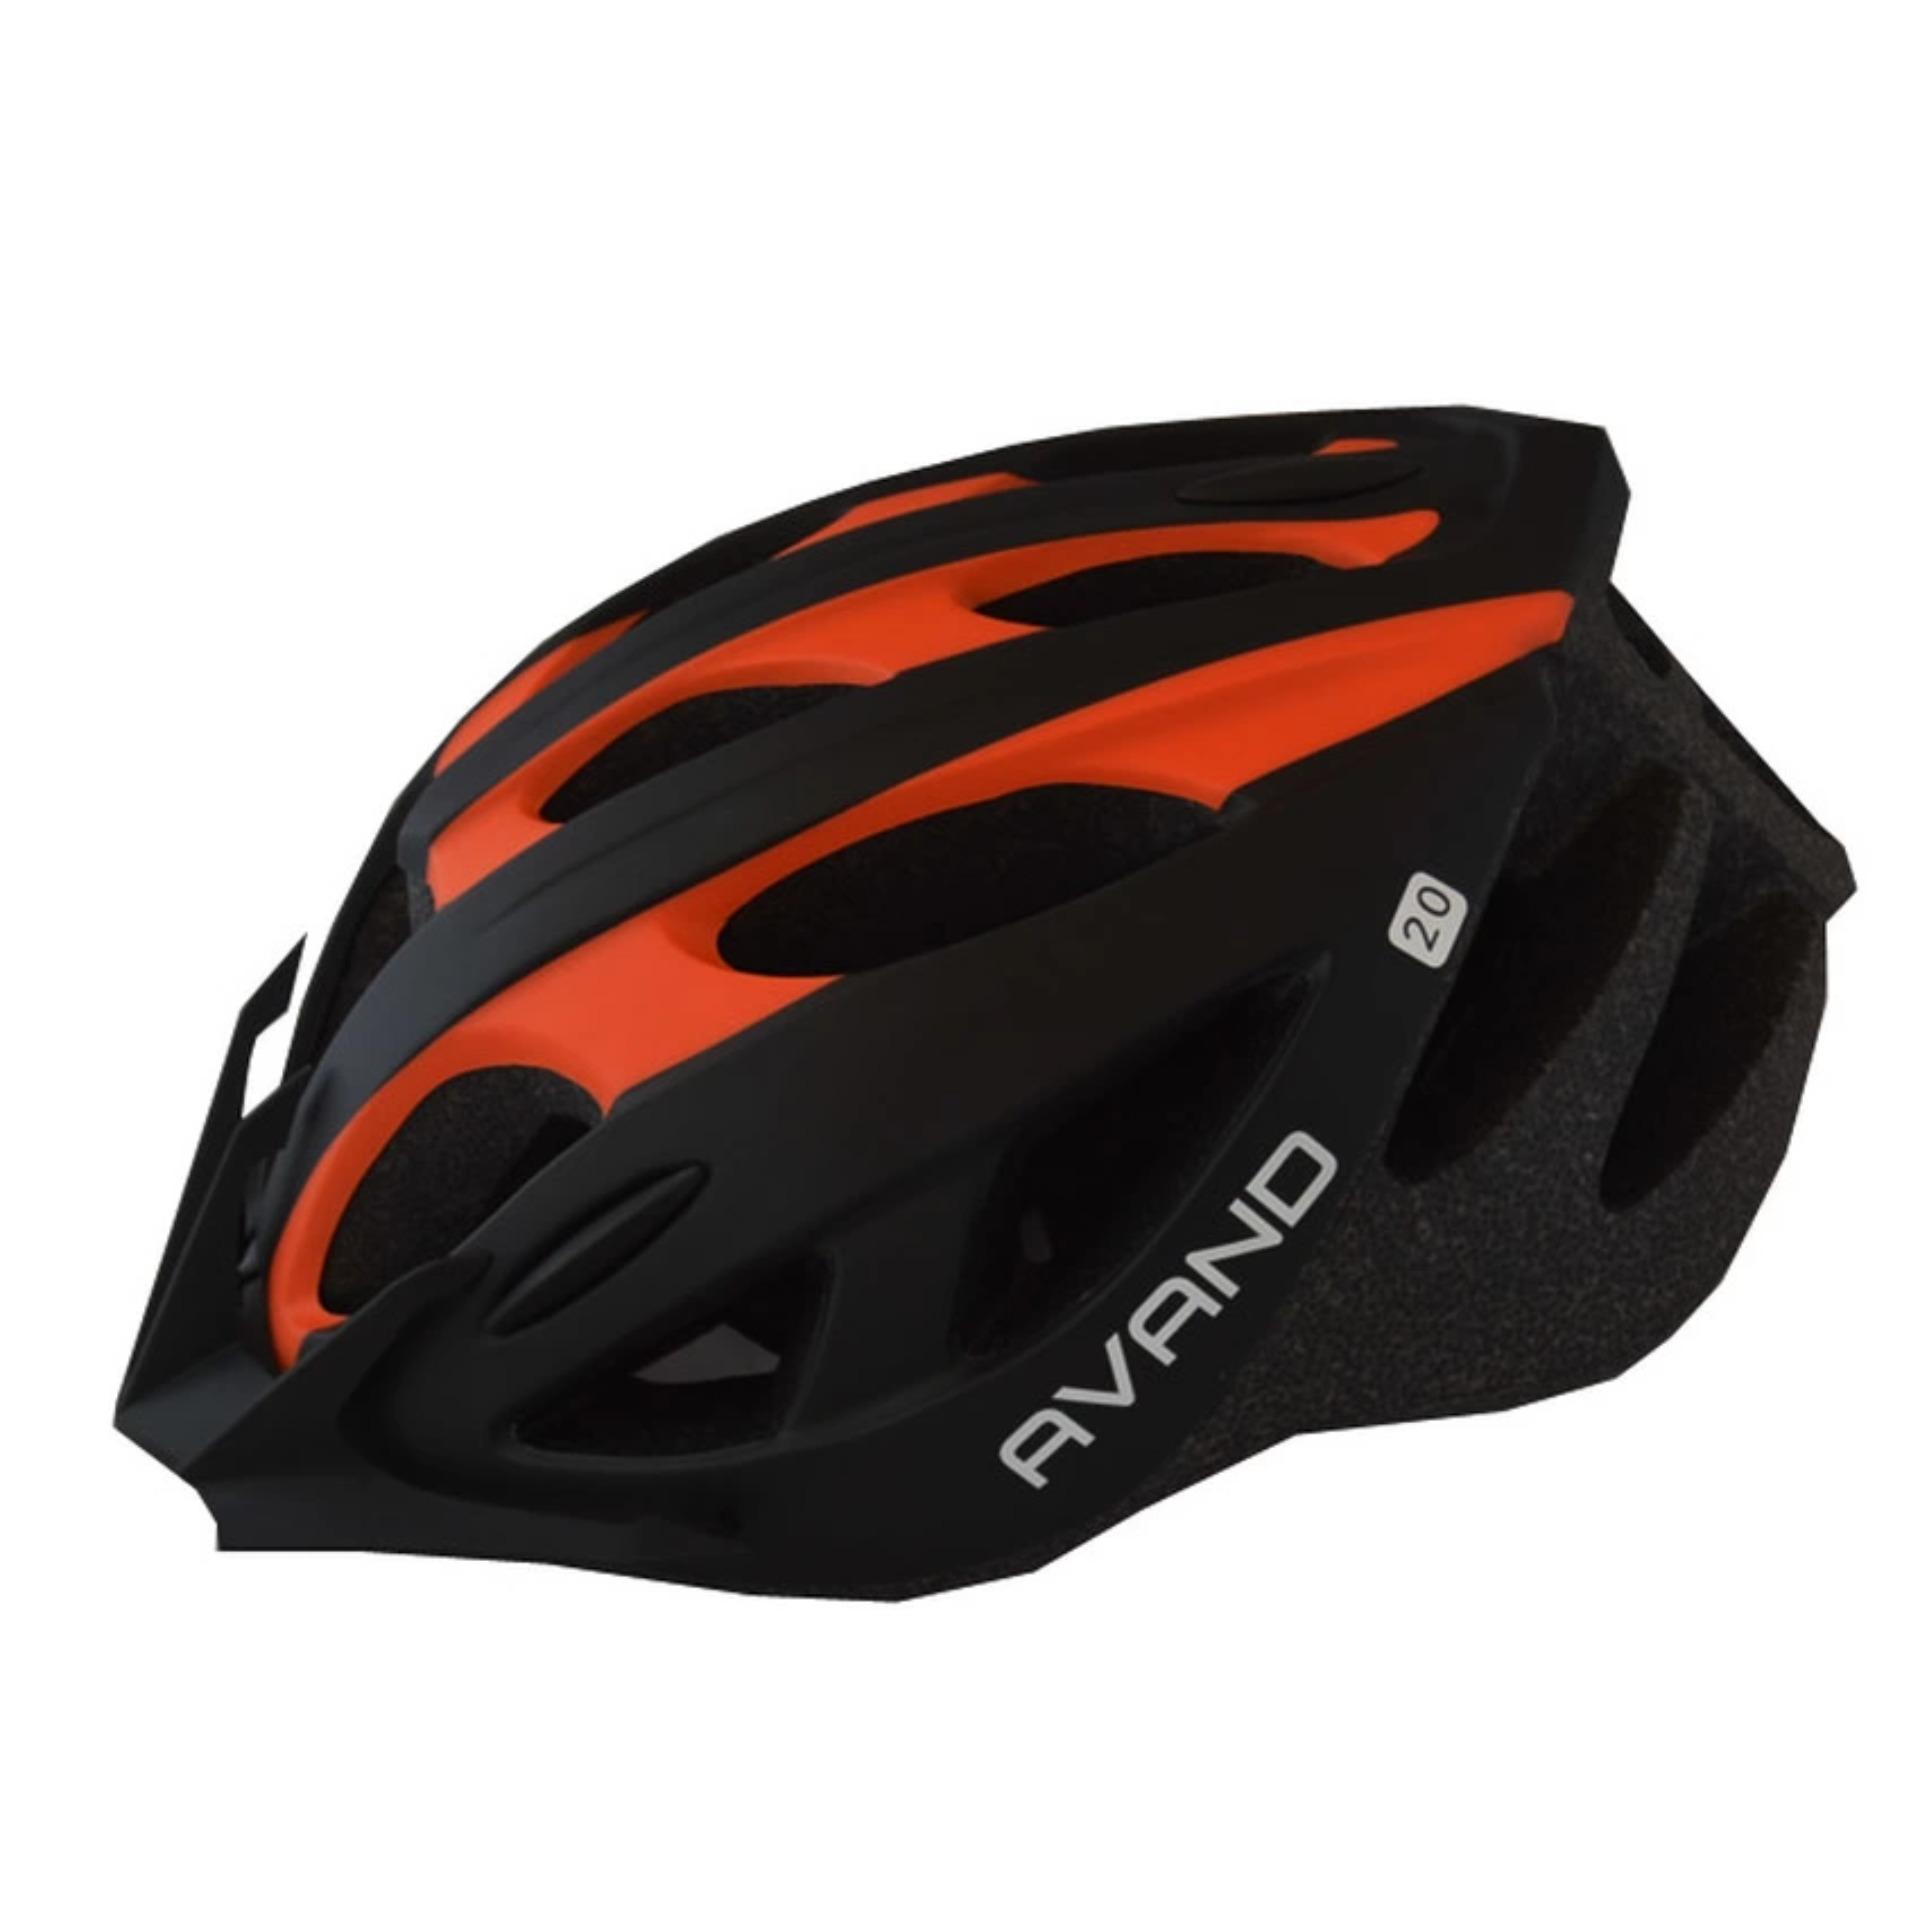 Kokasport Helm Sepatu Roda Anak   Helm Sepeda Anak. Source ... Avand Helm  Sepeda A20 . 22b1da1c7e